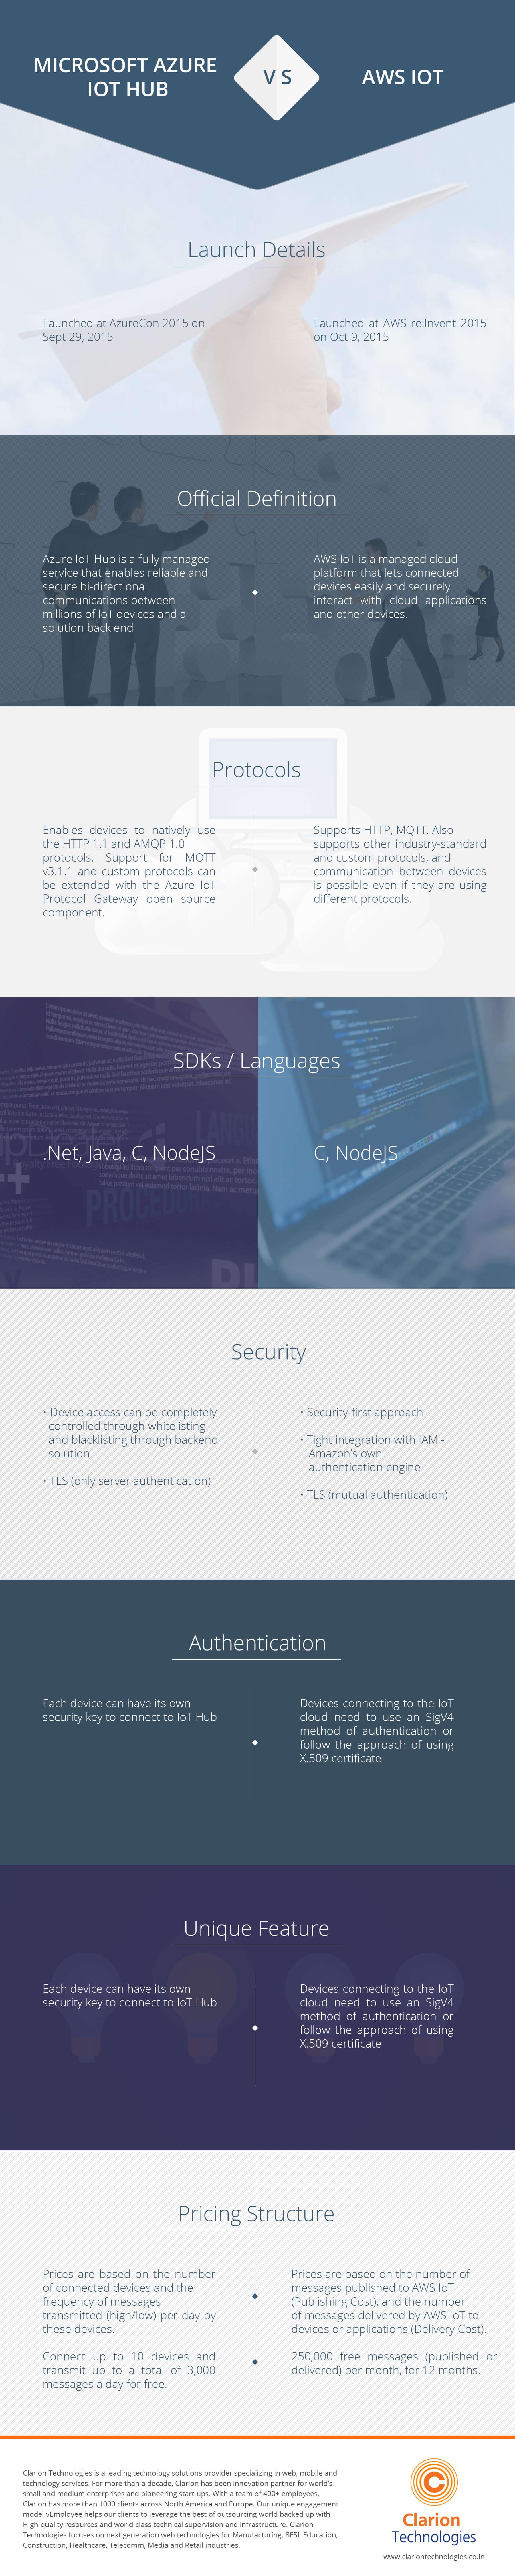 Microsoft-Azure-IoT-Hub-Vs-AWS-IoT